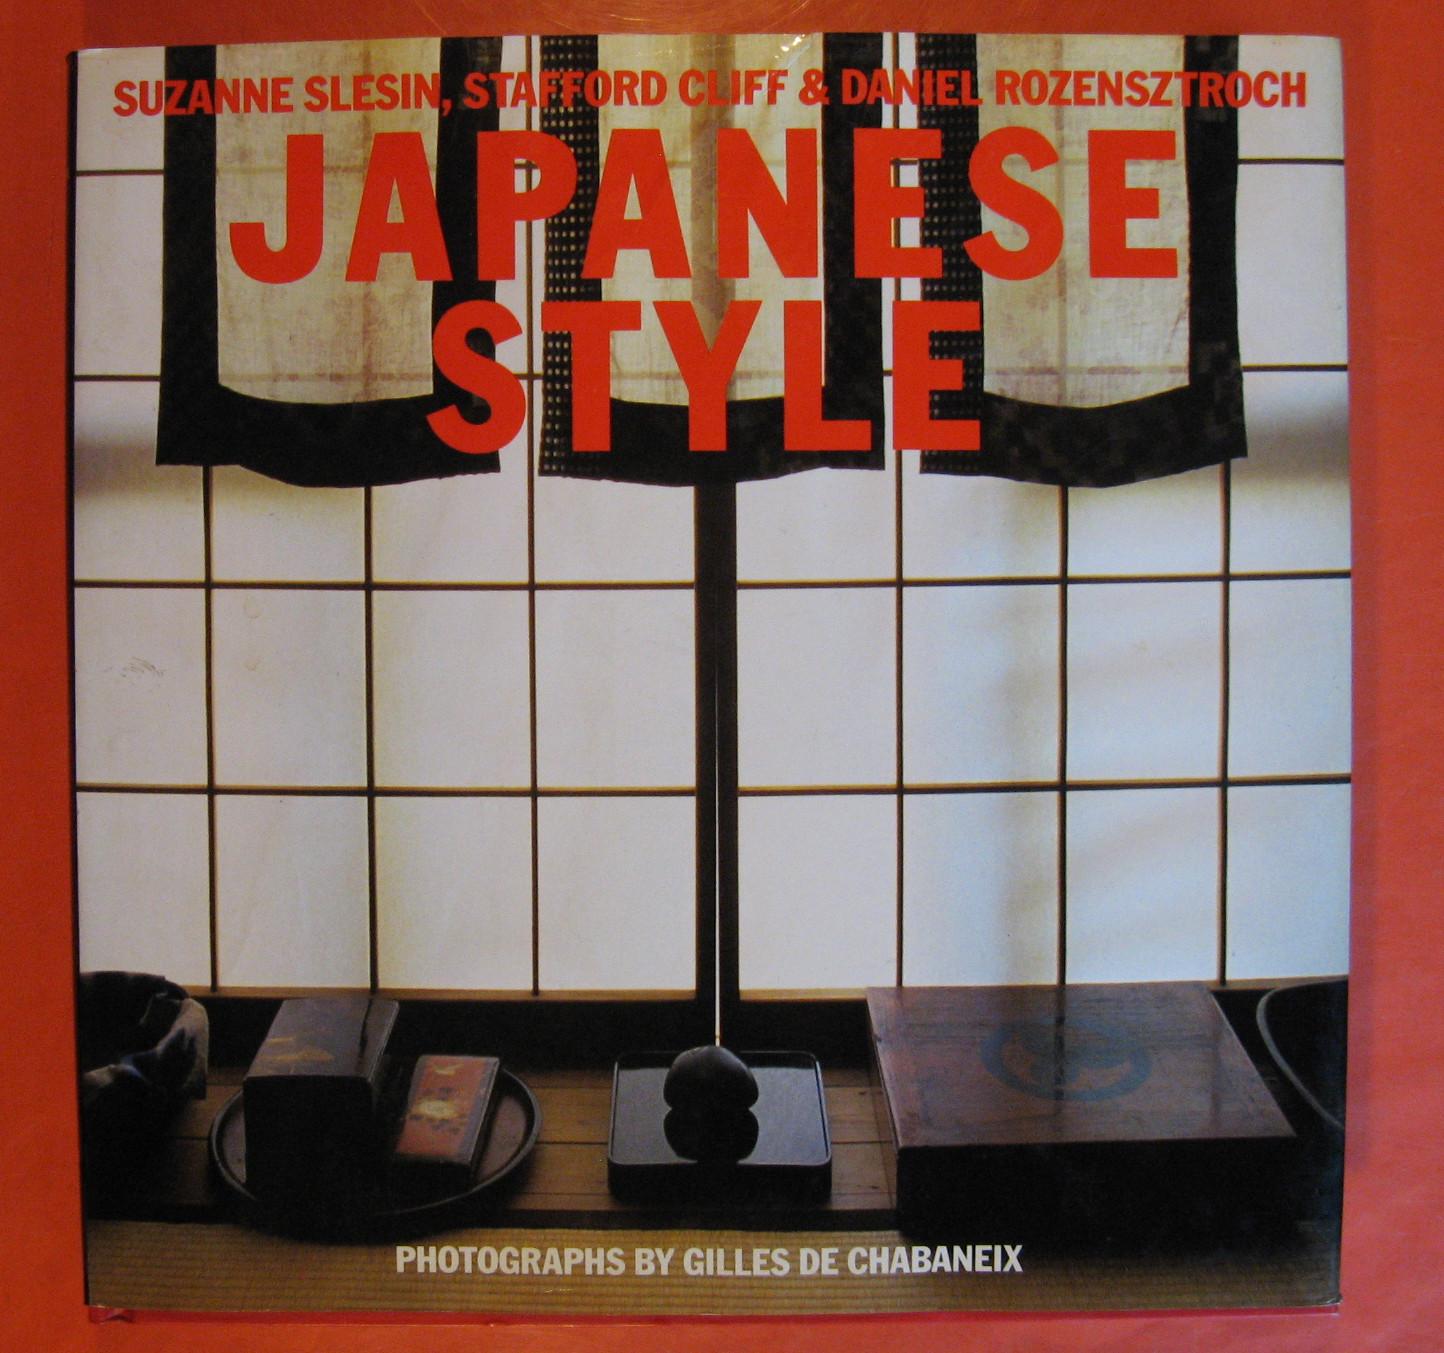 Japanese Style, Slesin, Suzanne; Cliff, Stafford; Rozensztroch, Daniel